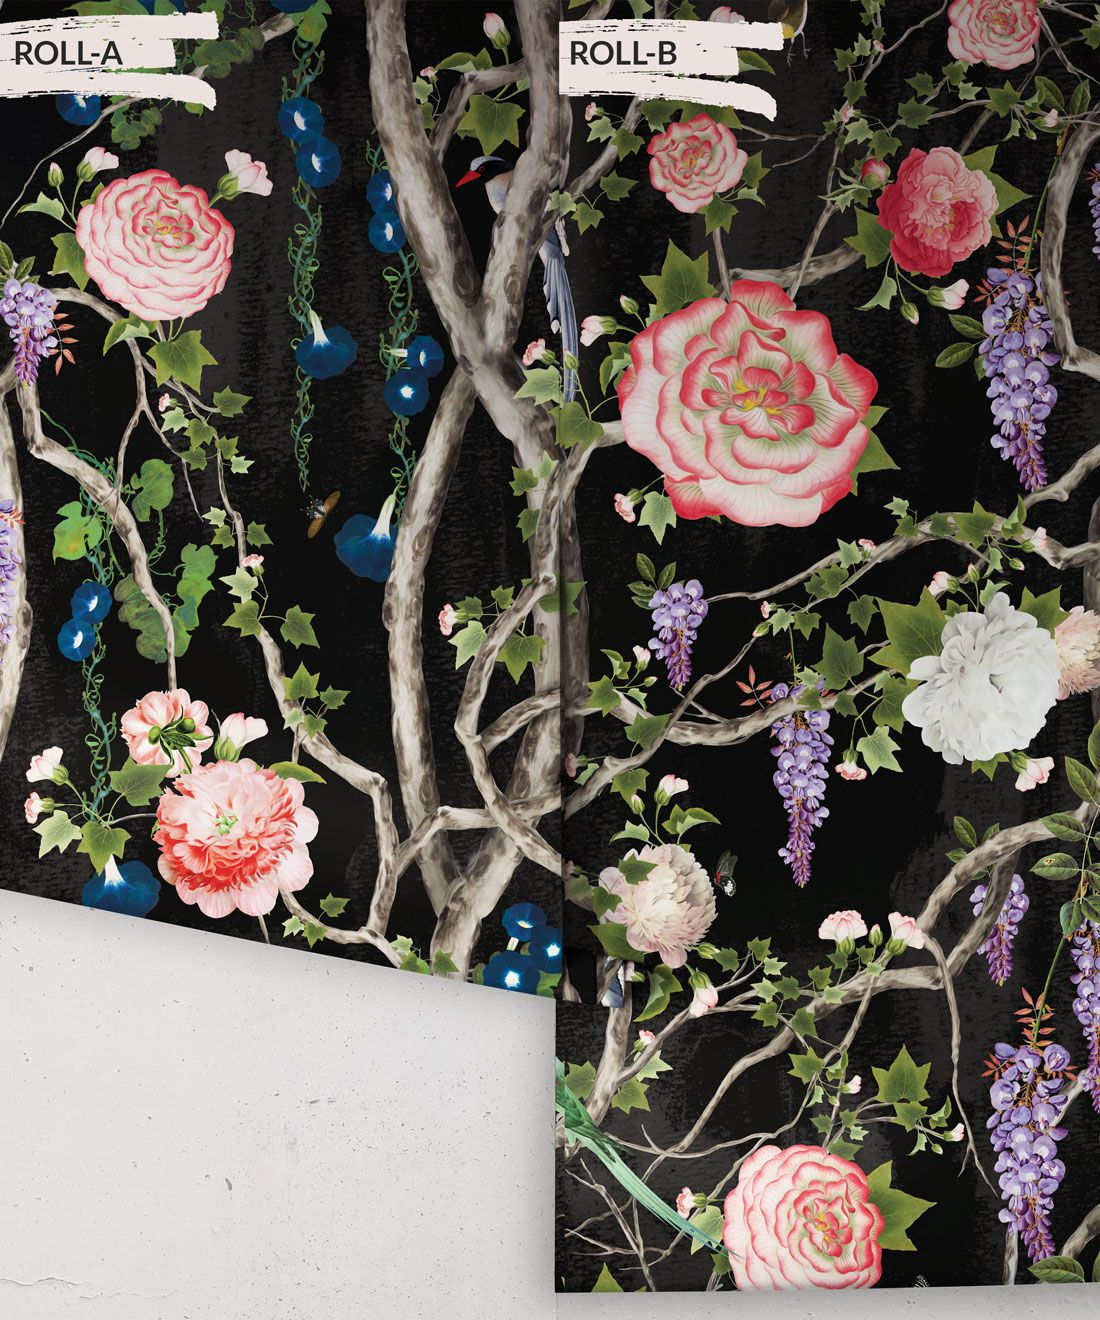 Empress Wallpaper • Romantic Wallpaper • Floral Wallpaper • Chinoiserie Wallpaper • Black Night colour wallpaper rolls